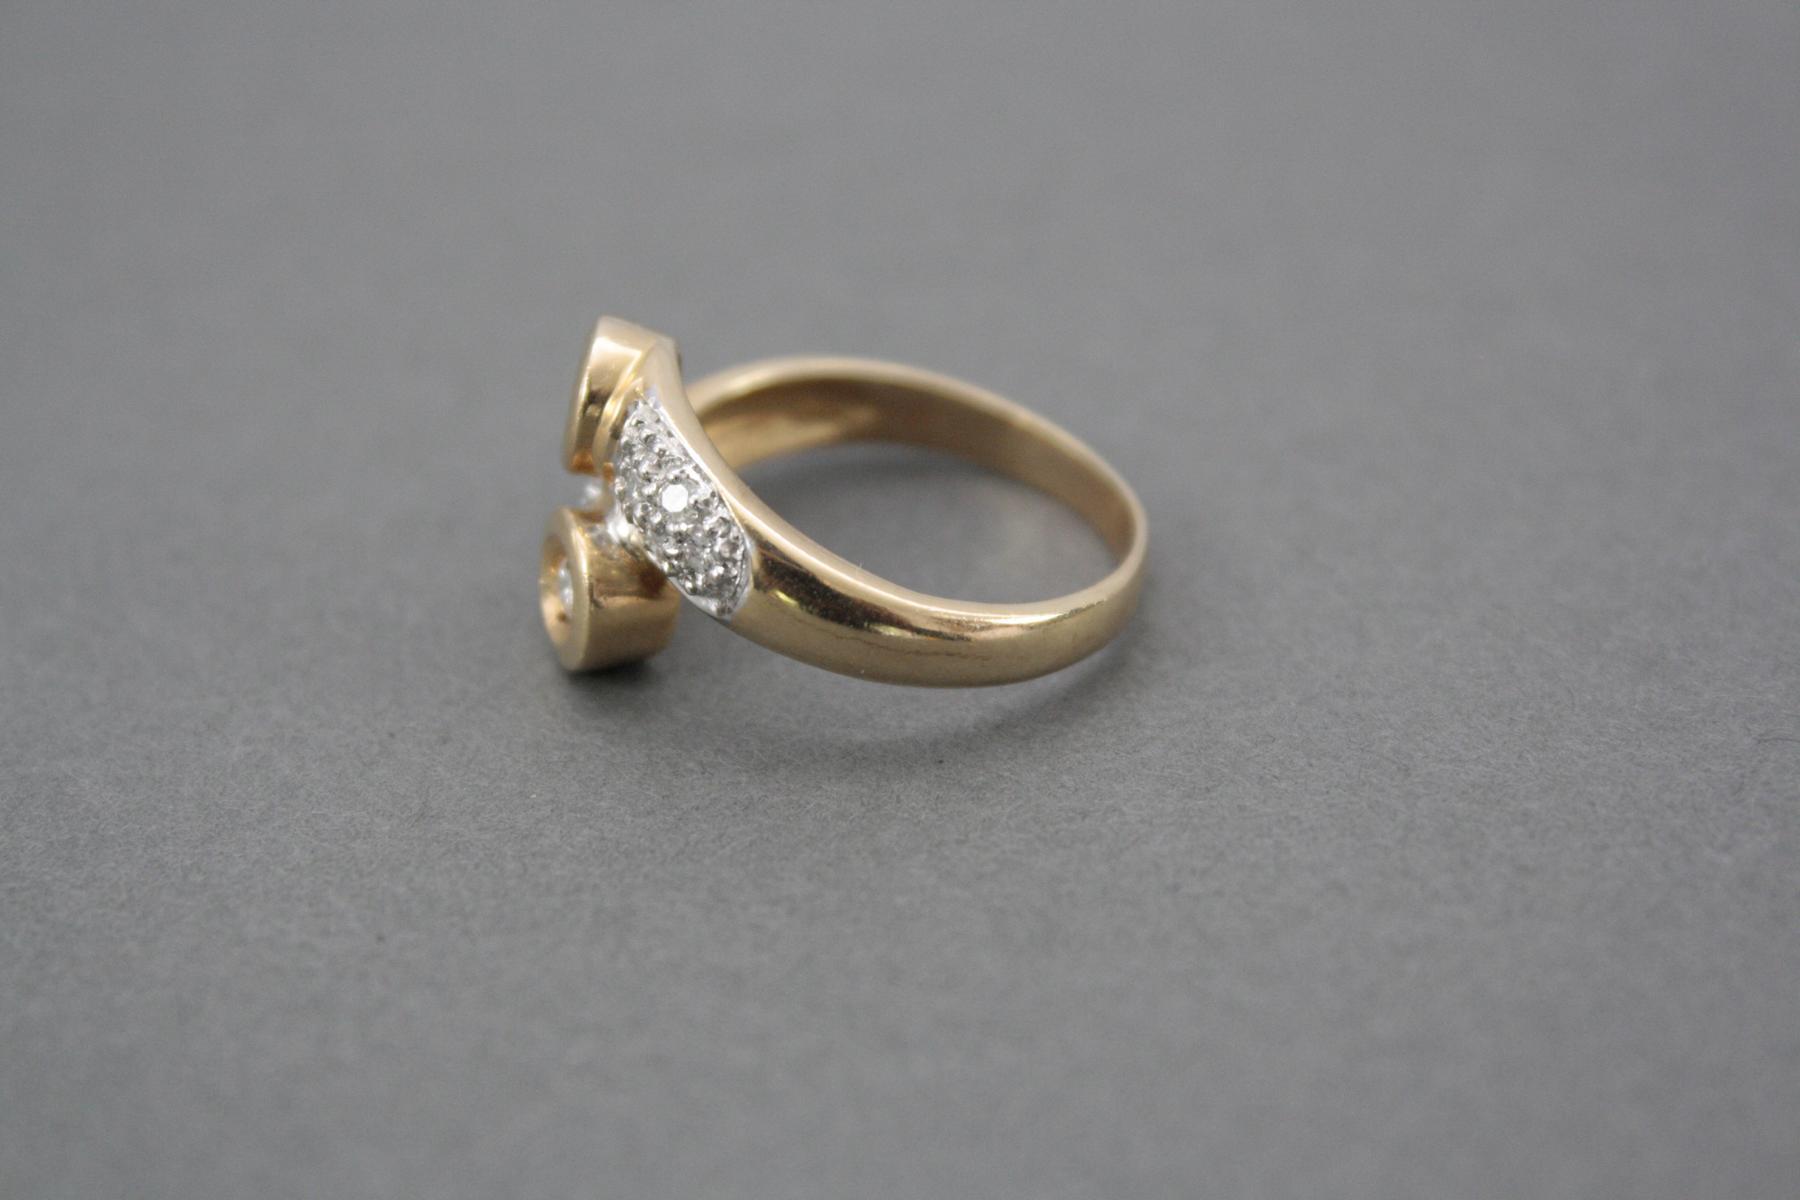 Damenring mit Diamanten, 14 Karat Gelbgold-3